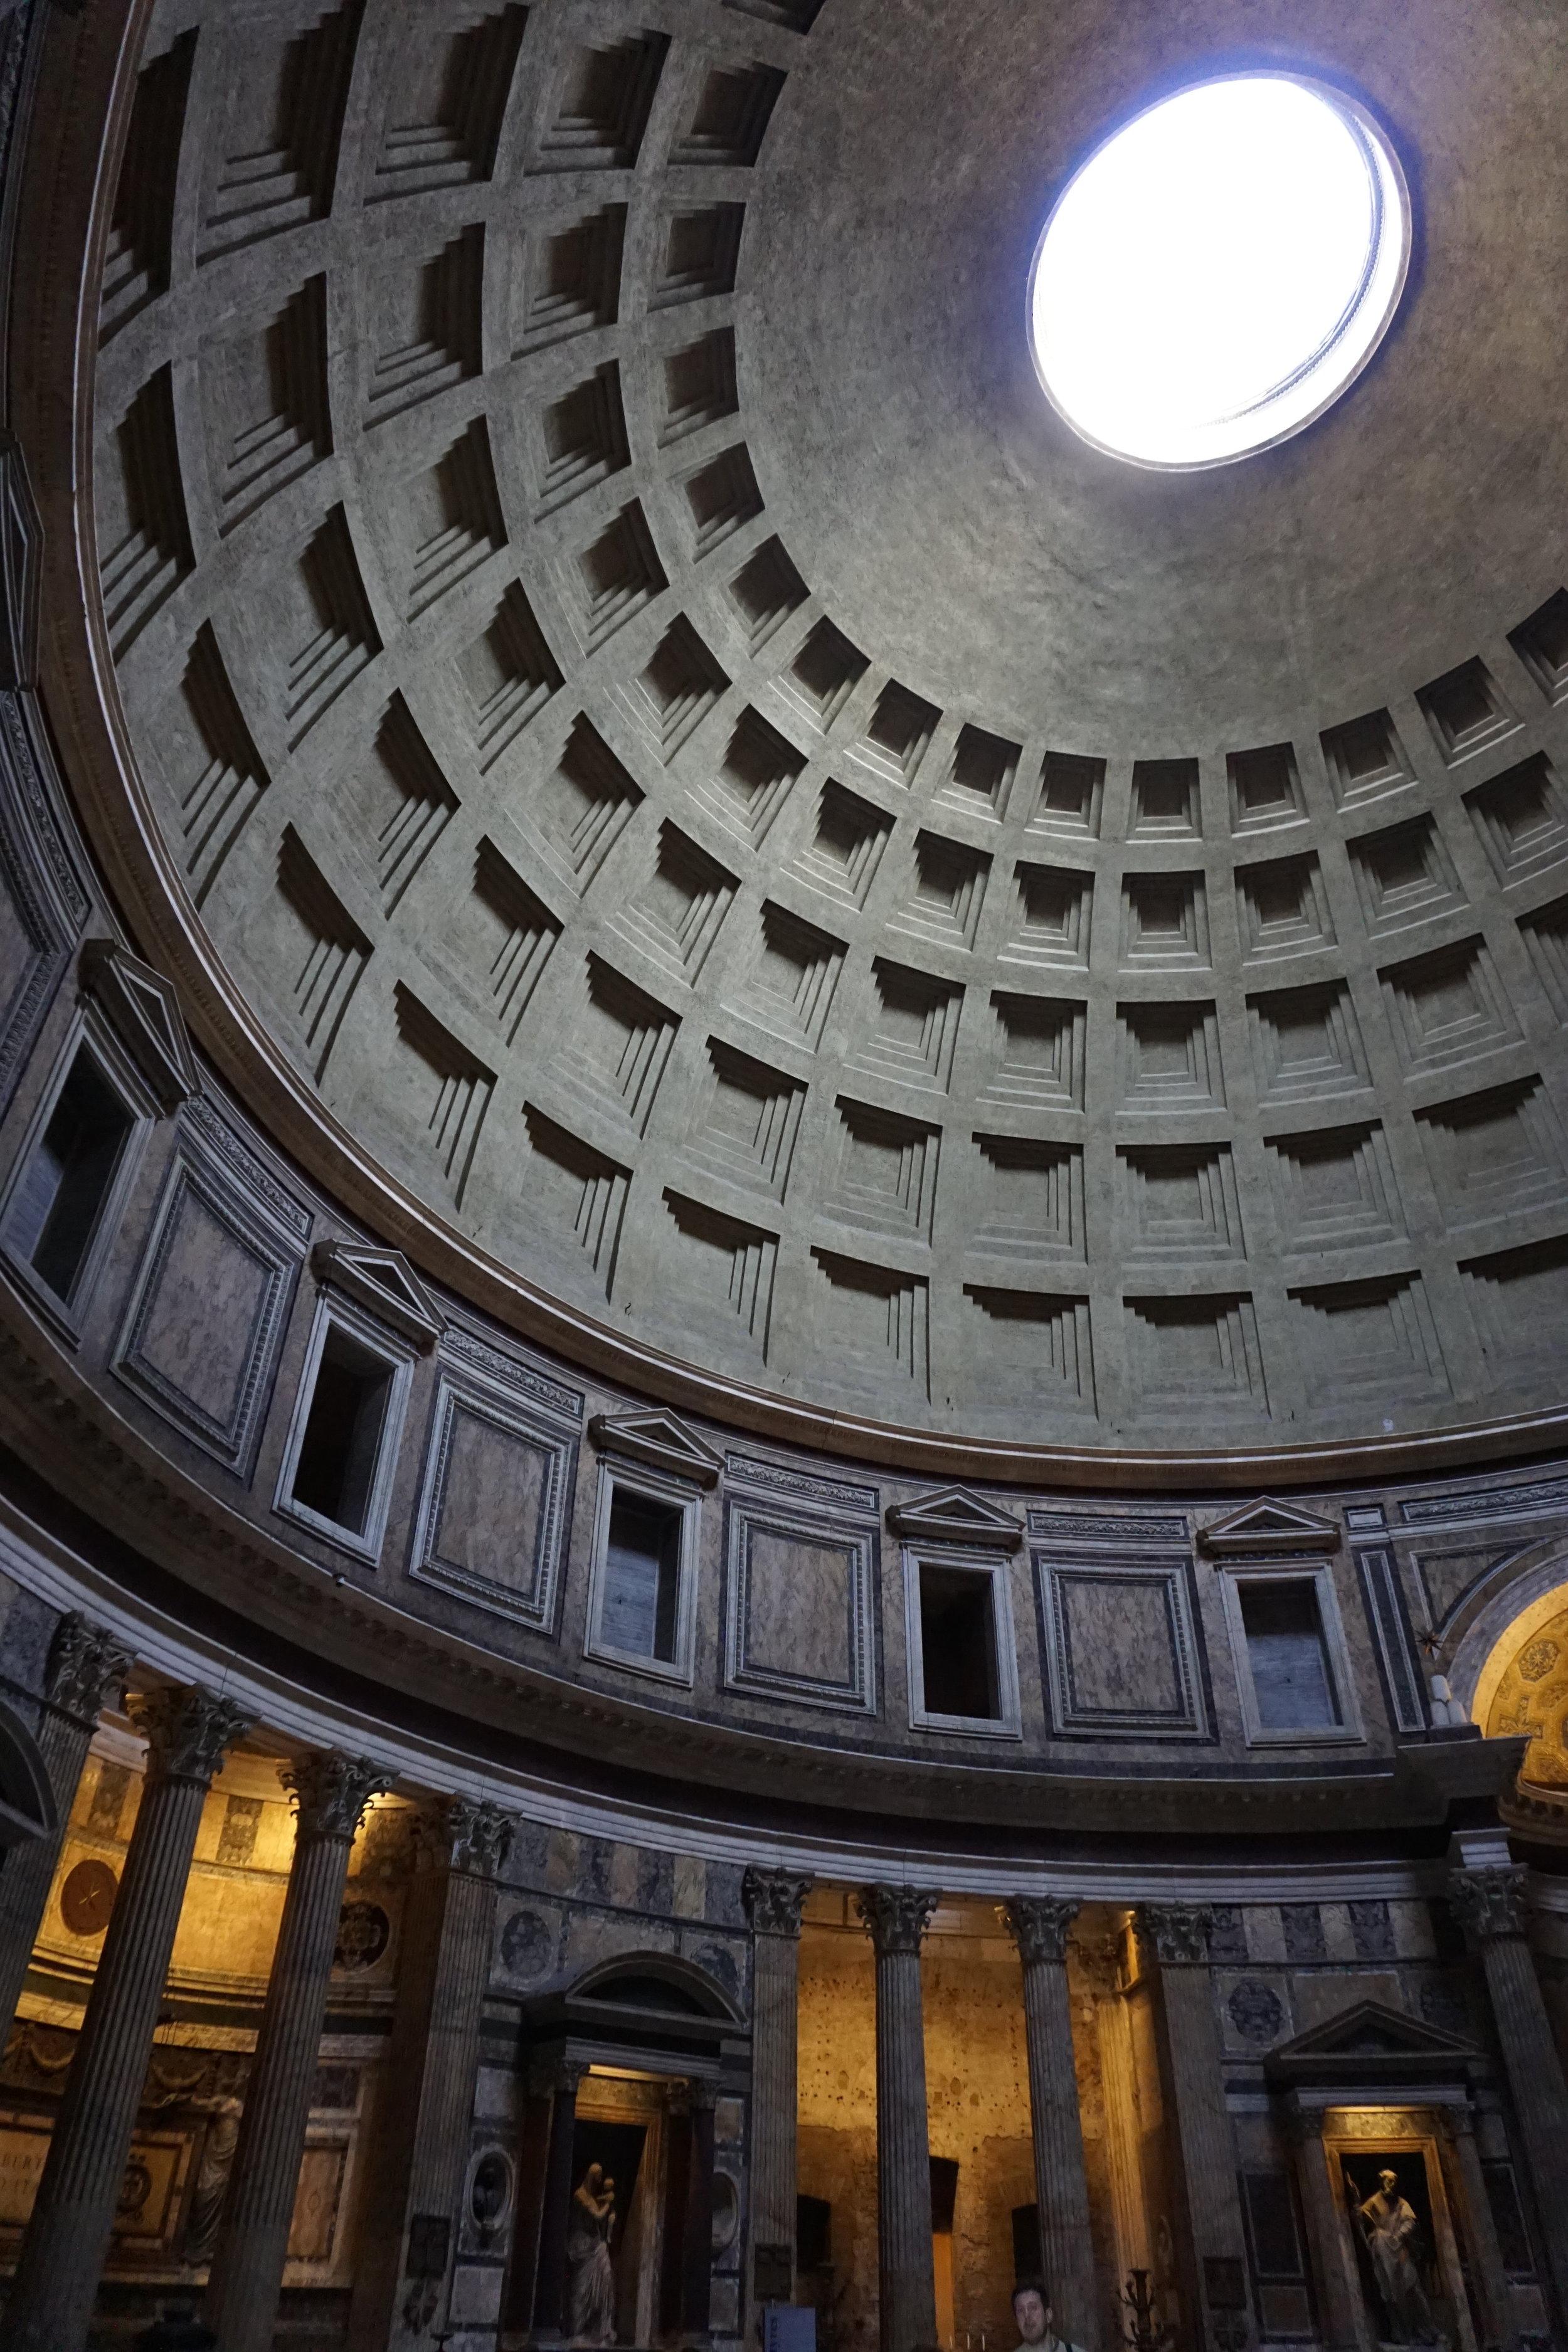 The Pantheon © 2016 David Harrop